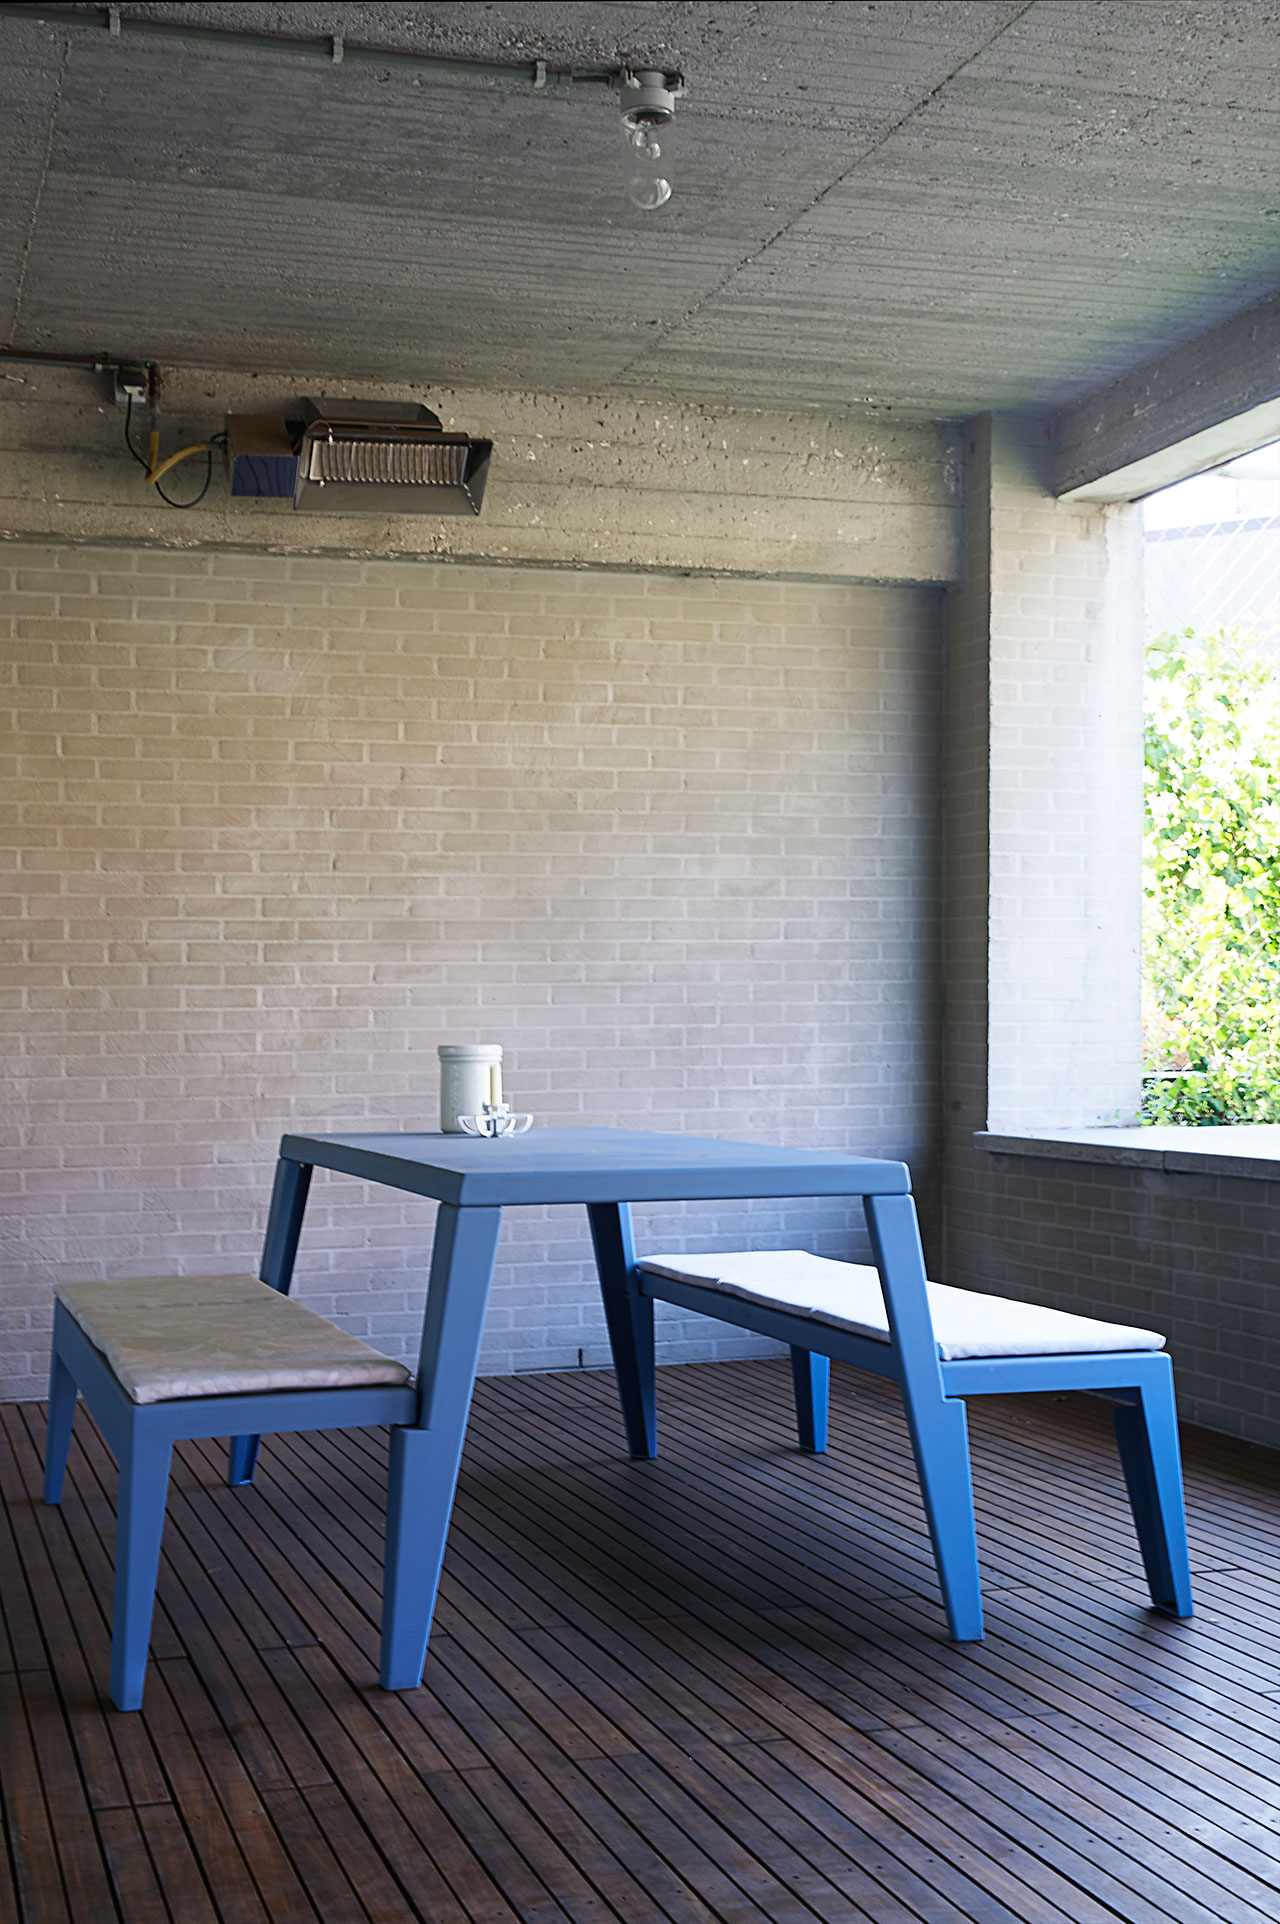 Terrace next to kitchen.Outdoor table Etcetera, Bram Boo for FELD, upholstered with Firmship Fabric by Studio Job.Silhouette Sconce, Studio Job, 2005.Pot, Royal Tichelaar Makkum, Studio Job, 2009.Photo by Dennis Brandsma.